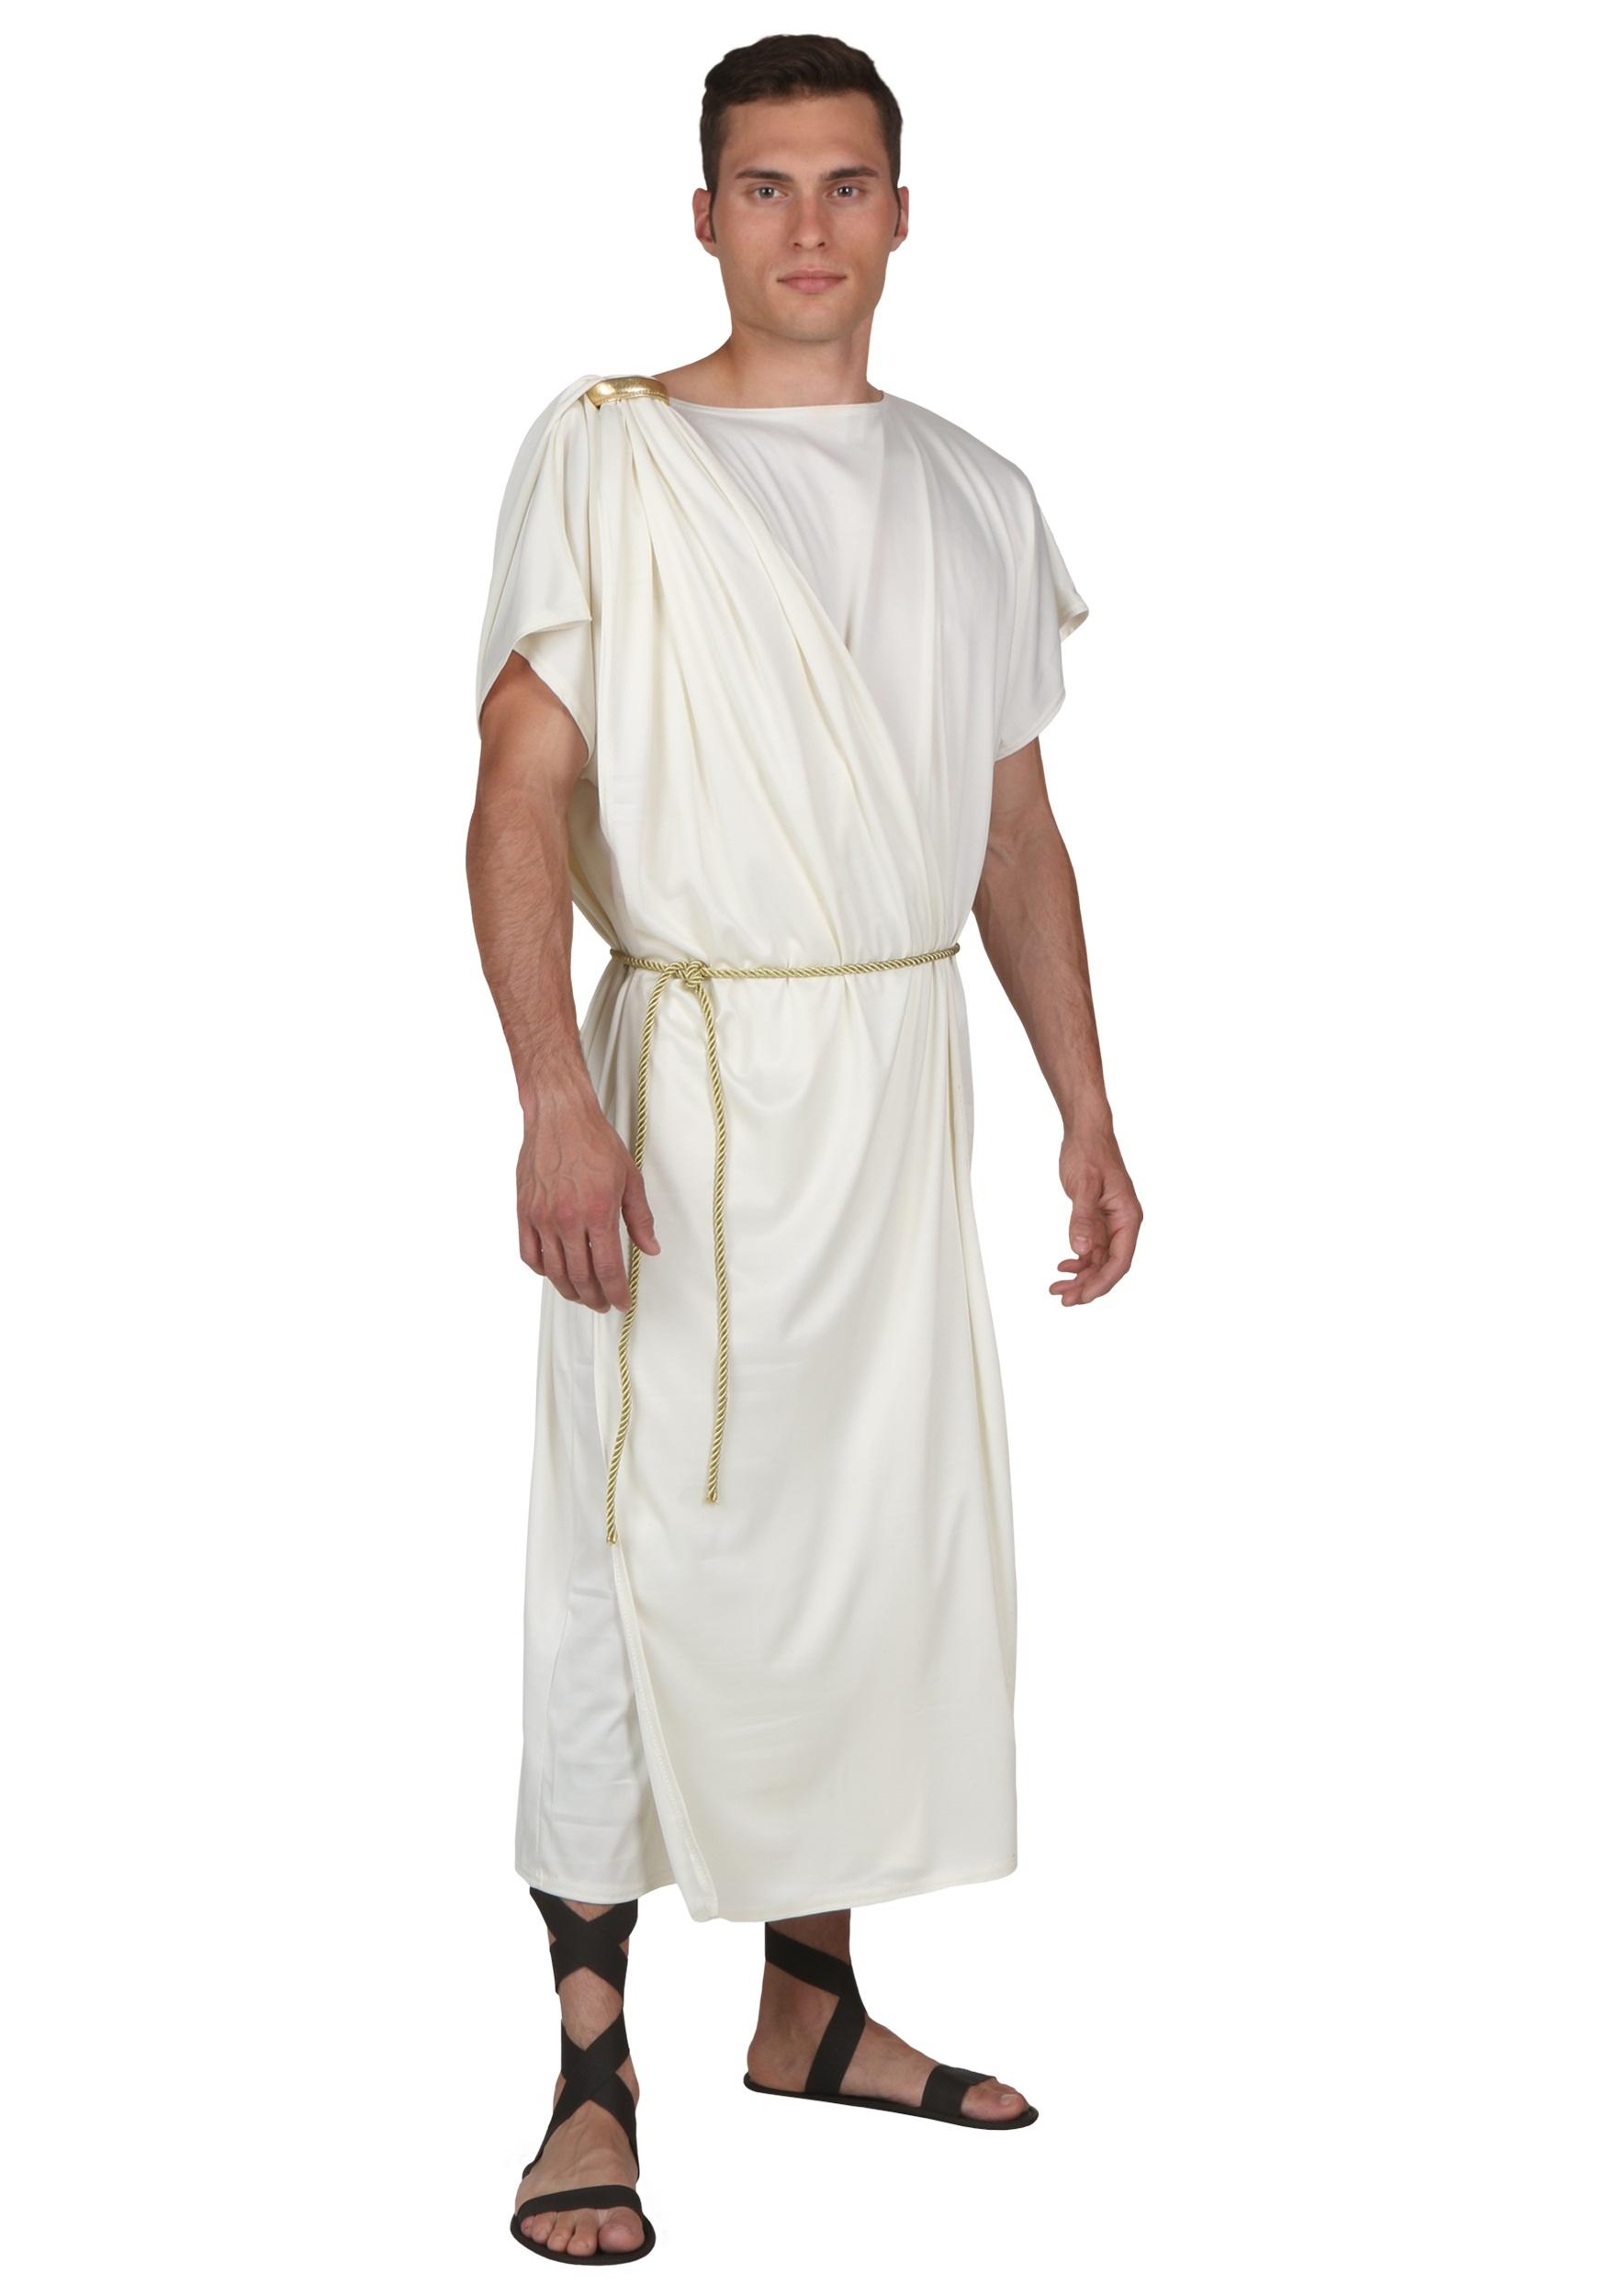 Toga Halloween Fancy Dress Costume for Men